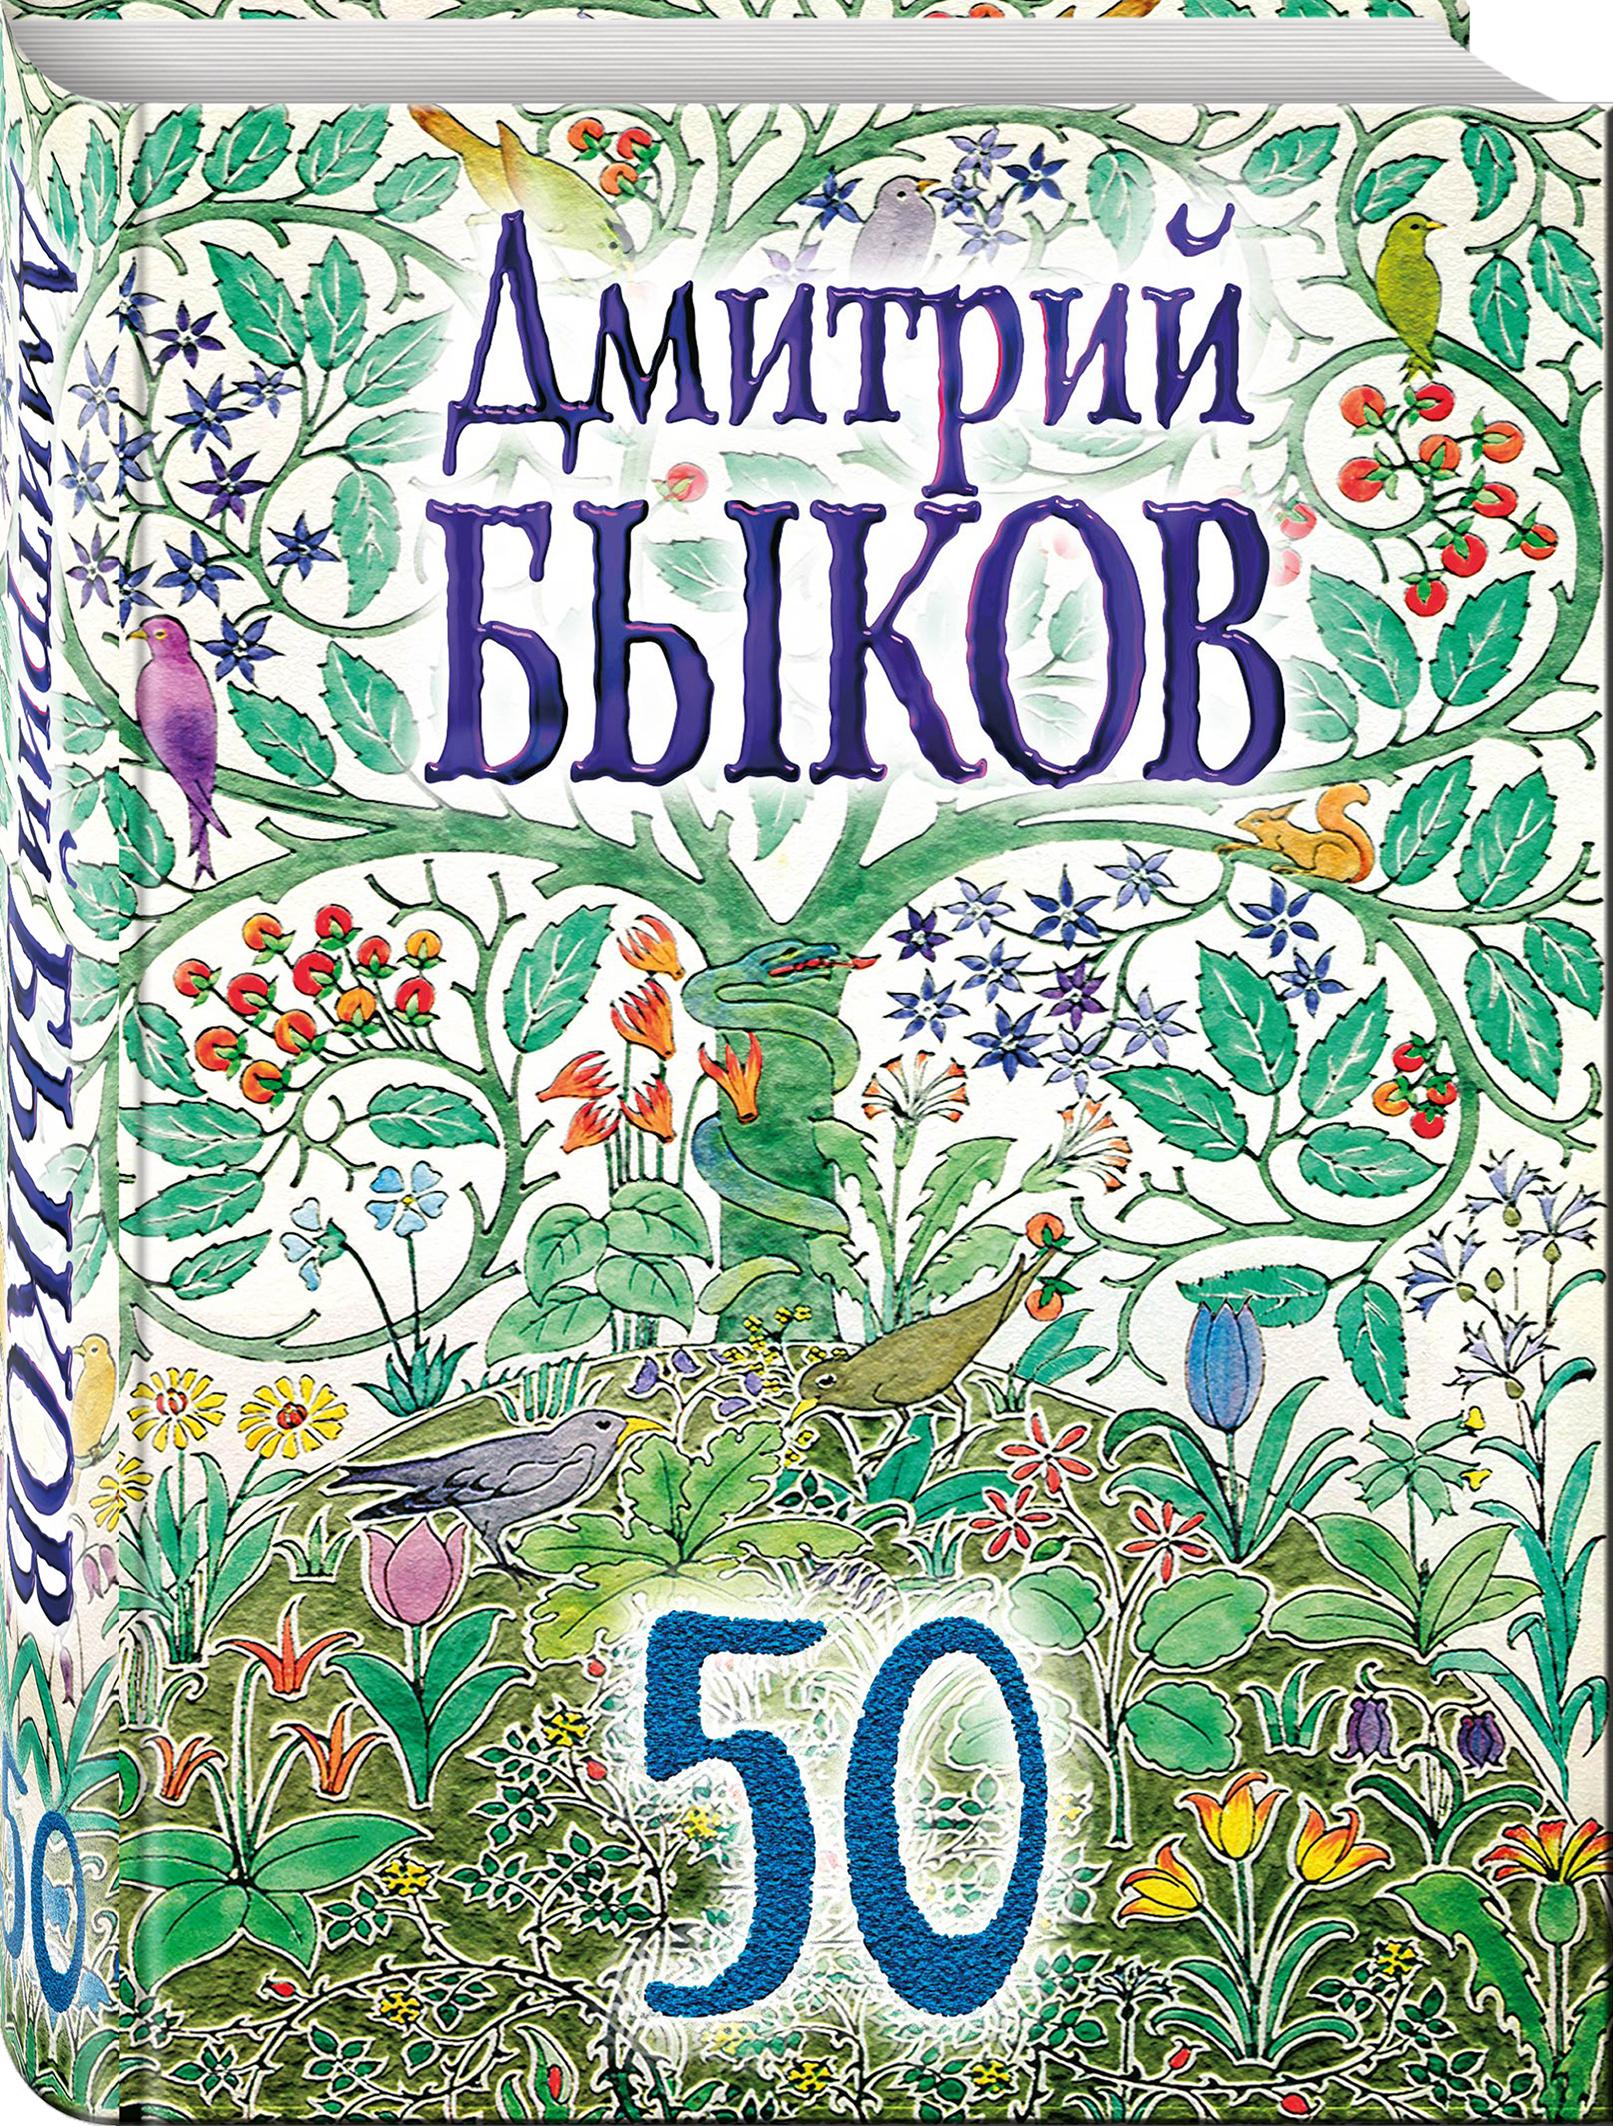 Дмитрий Быков 50 дмитрий левочский режимбога